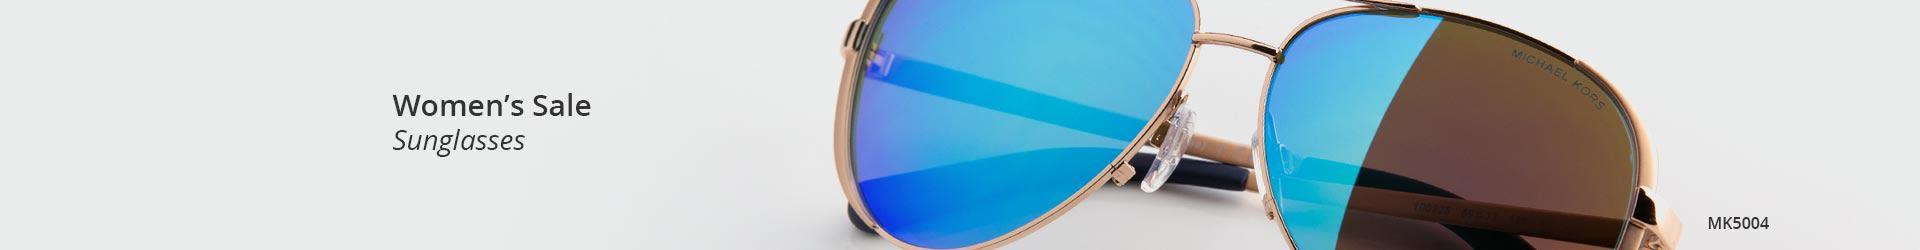 Women's Sunglasses Sale